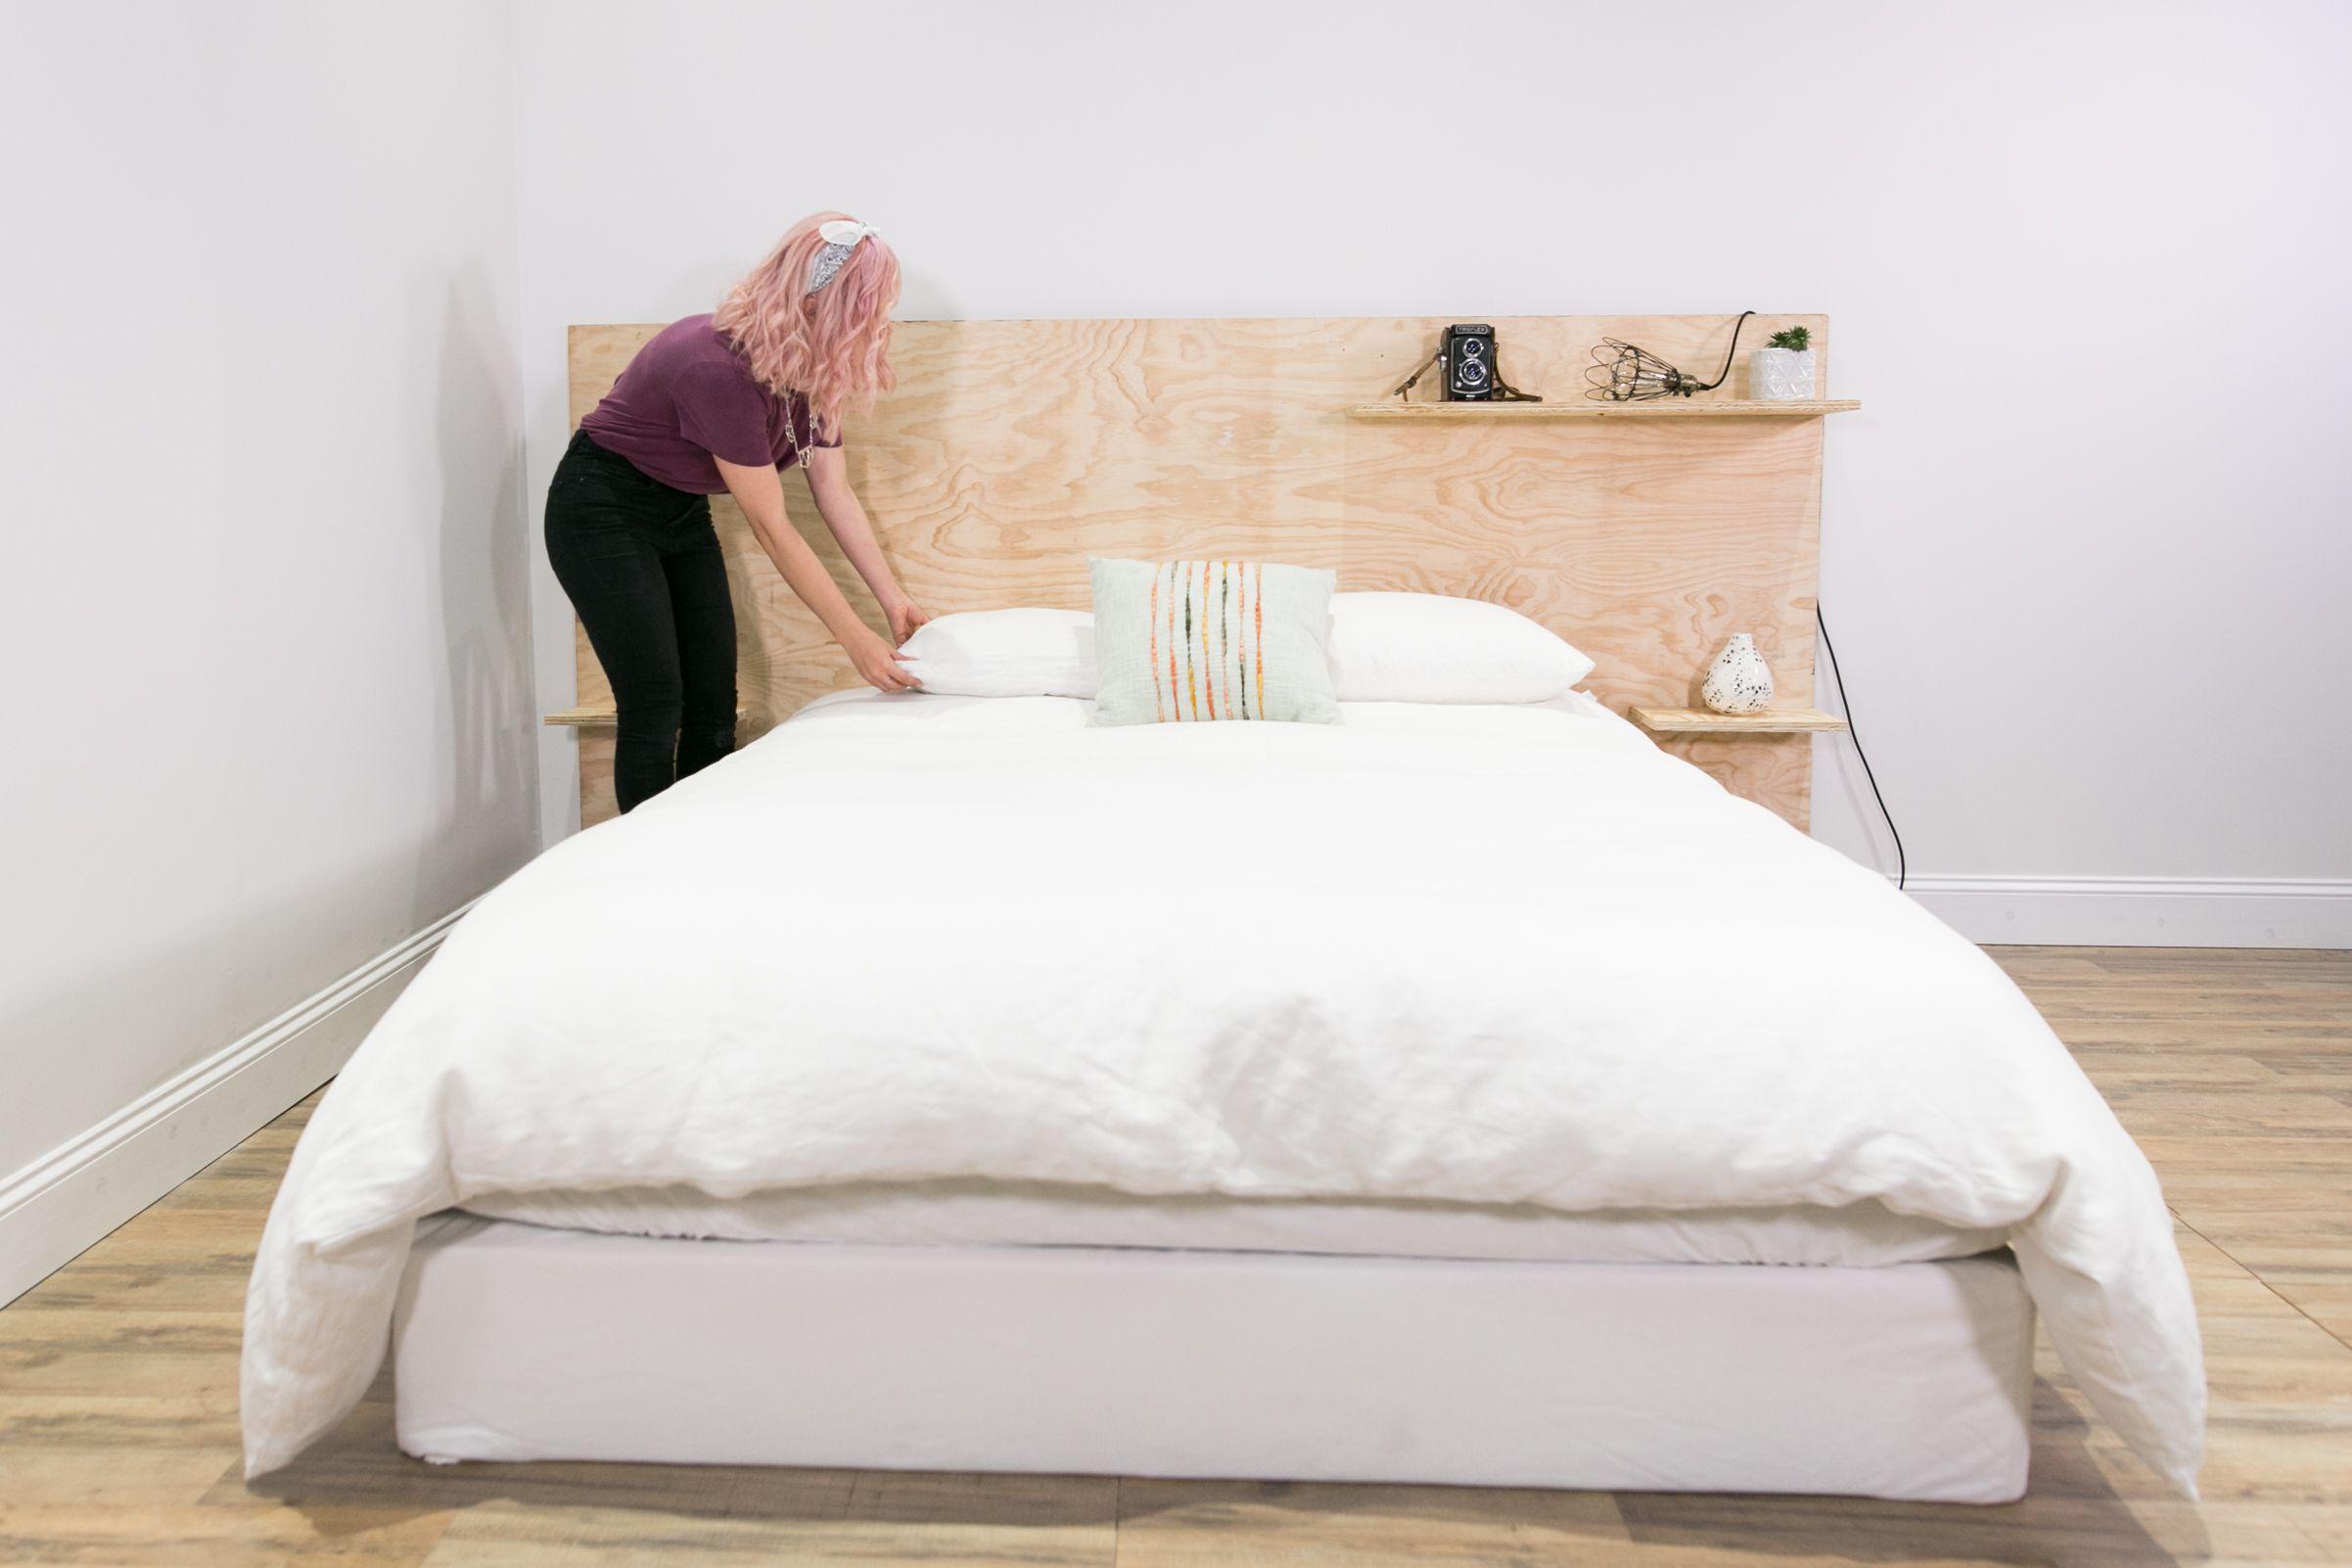 Diy Minimalist Plywood Shelf Headboard Bed Headboard Design